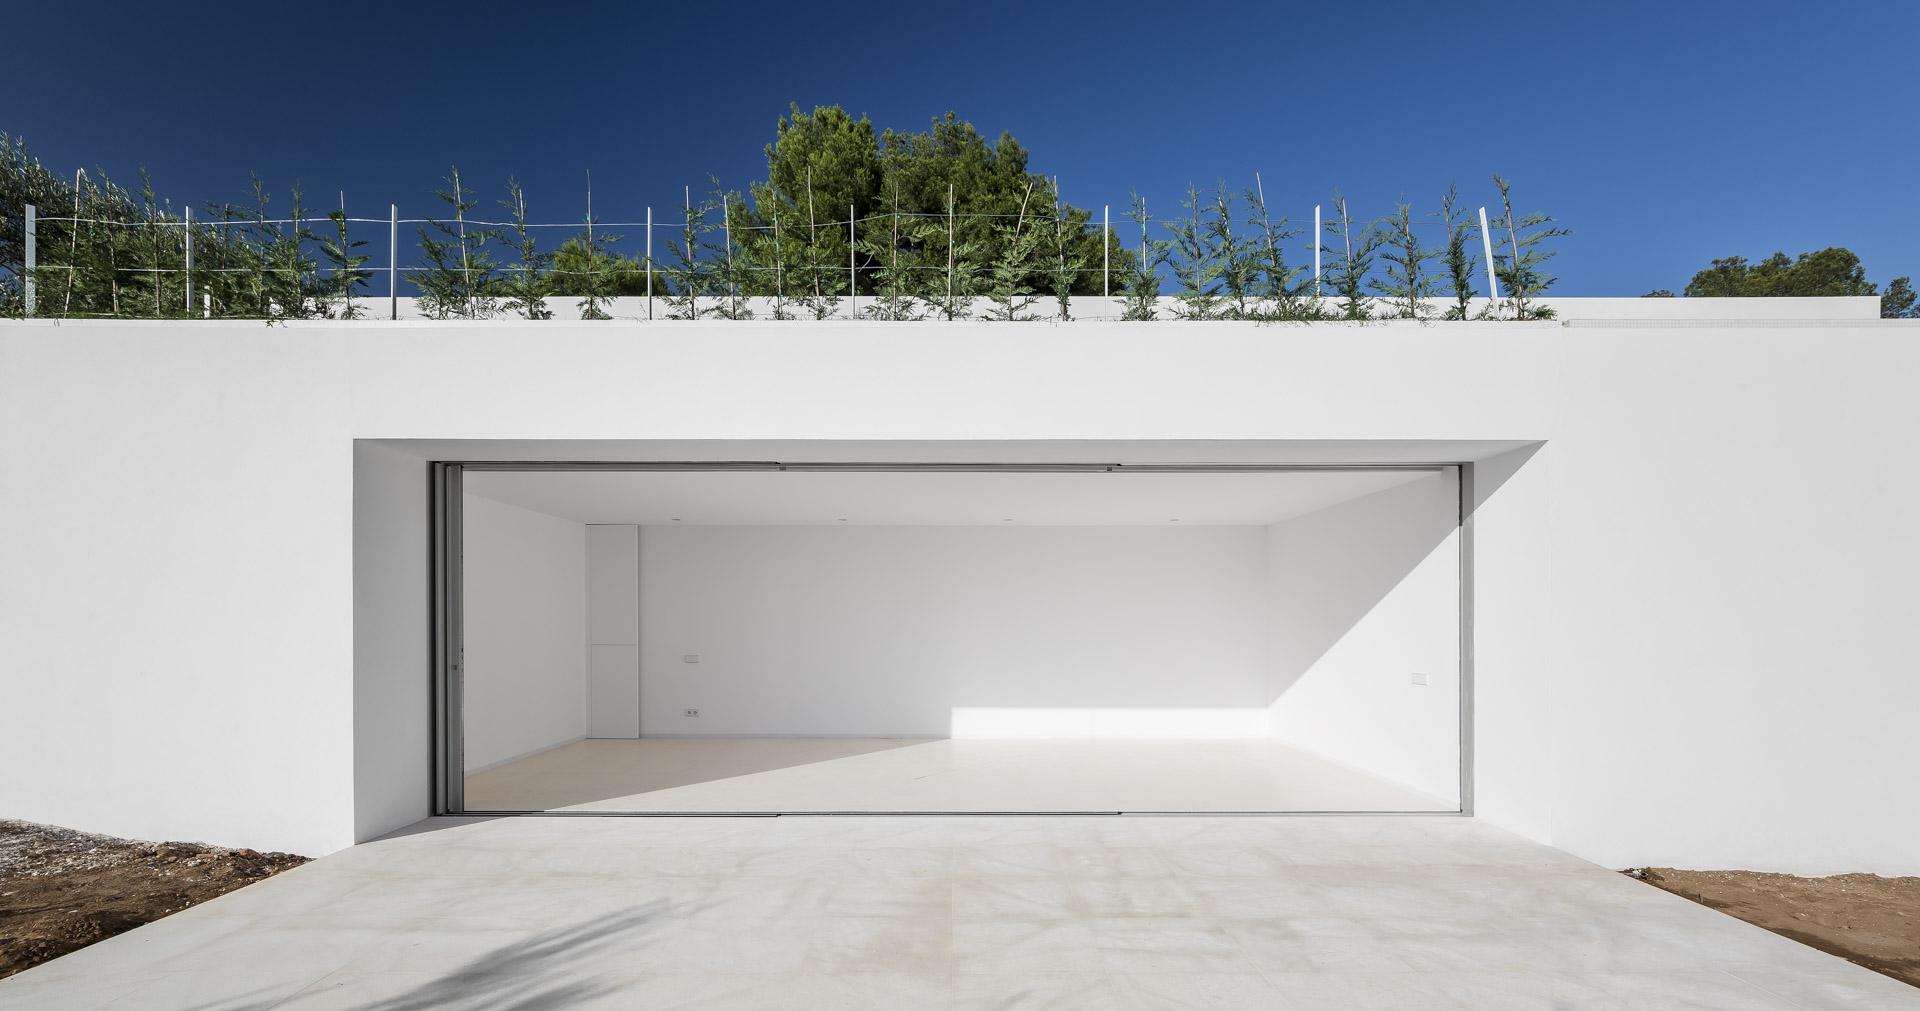 fotografia-arquitectura-valencia-german-cabo-gallardo-llopis-villamarchante-vivienda-33